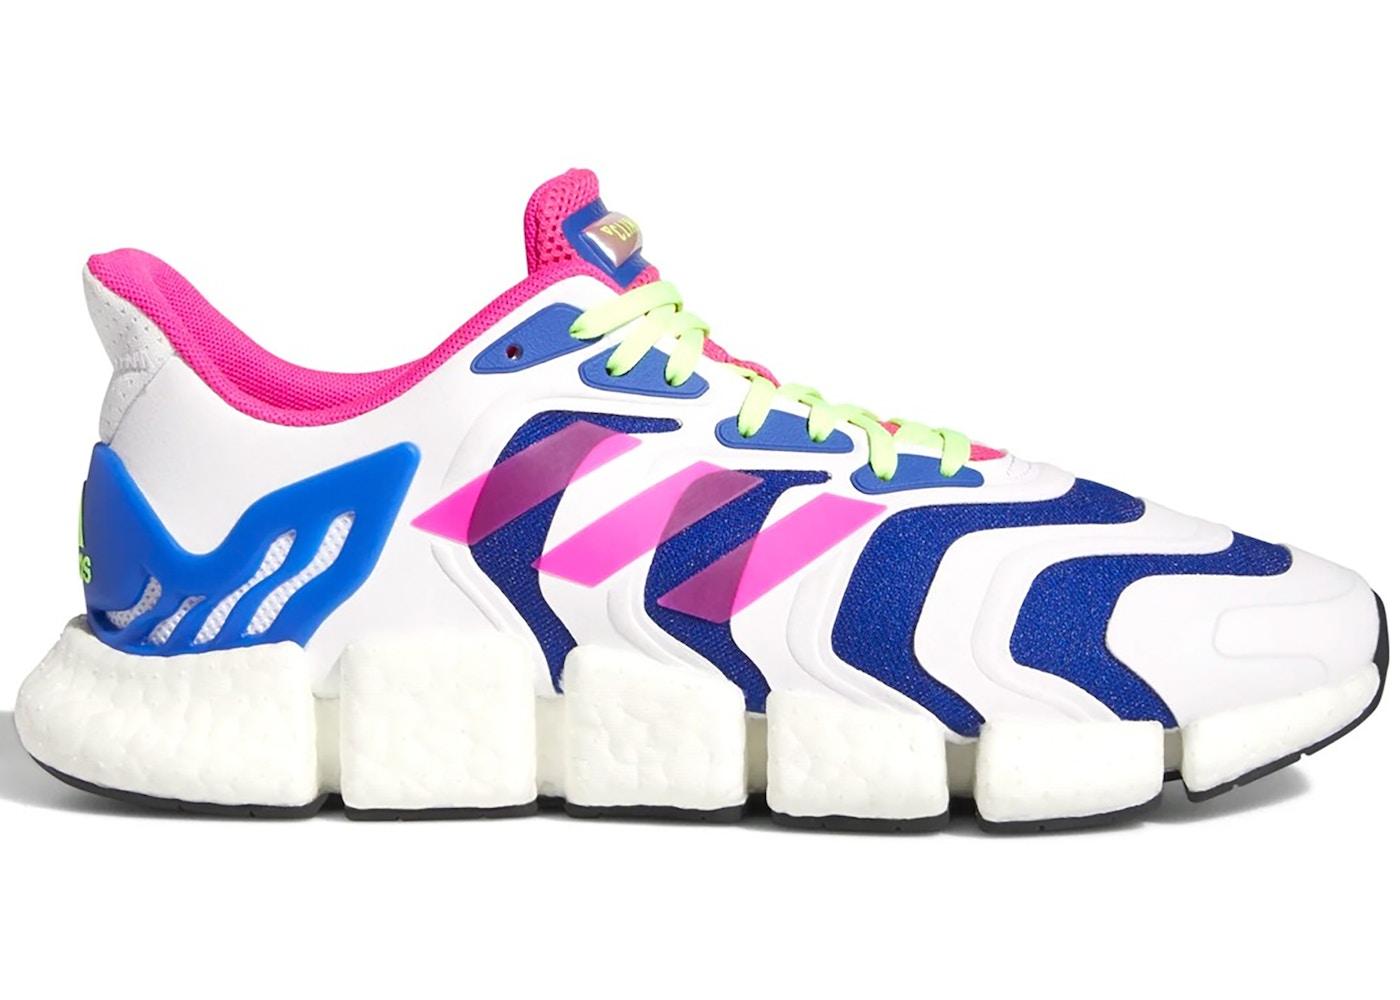 adidas Climacool Vento Shock Pink